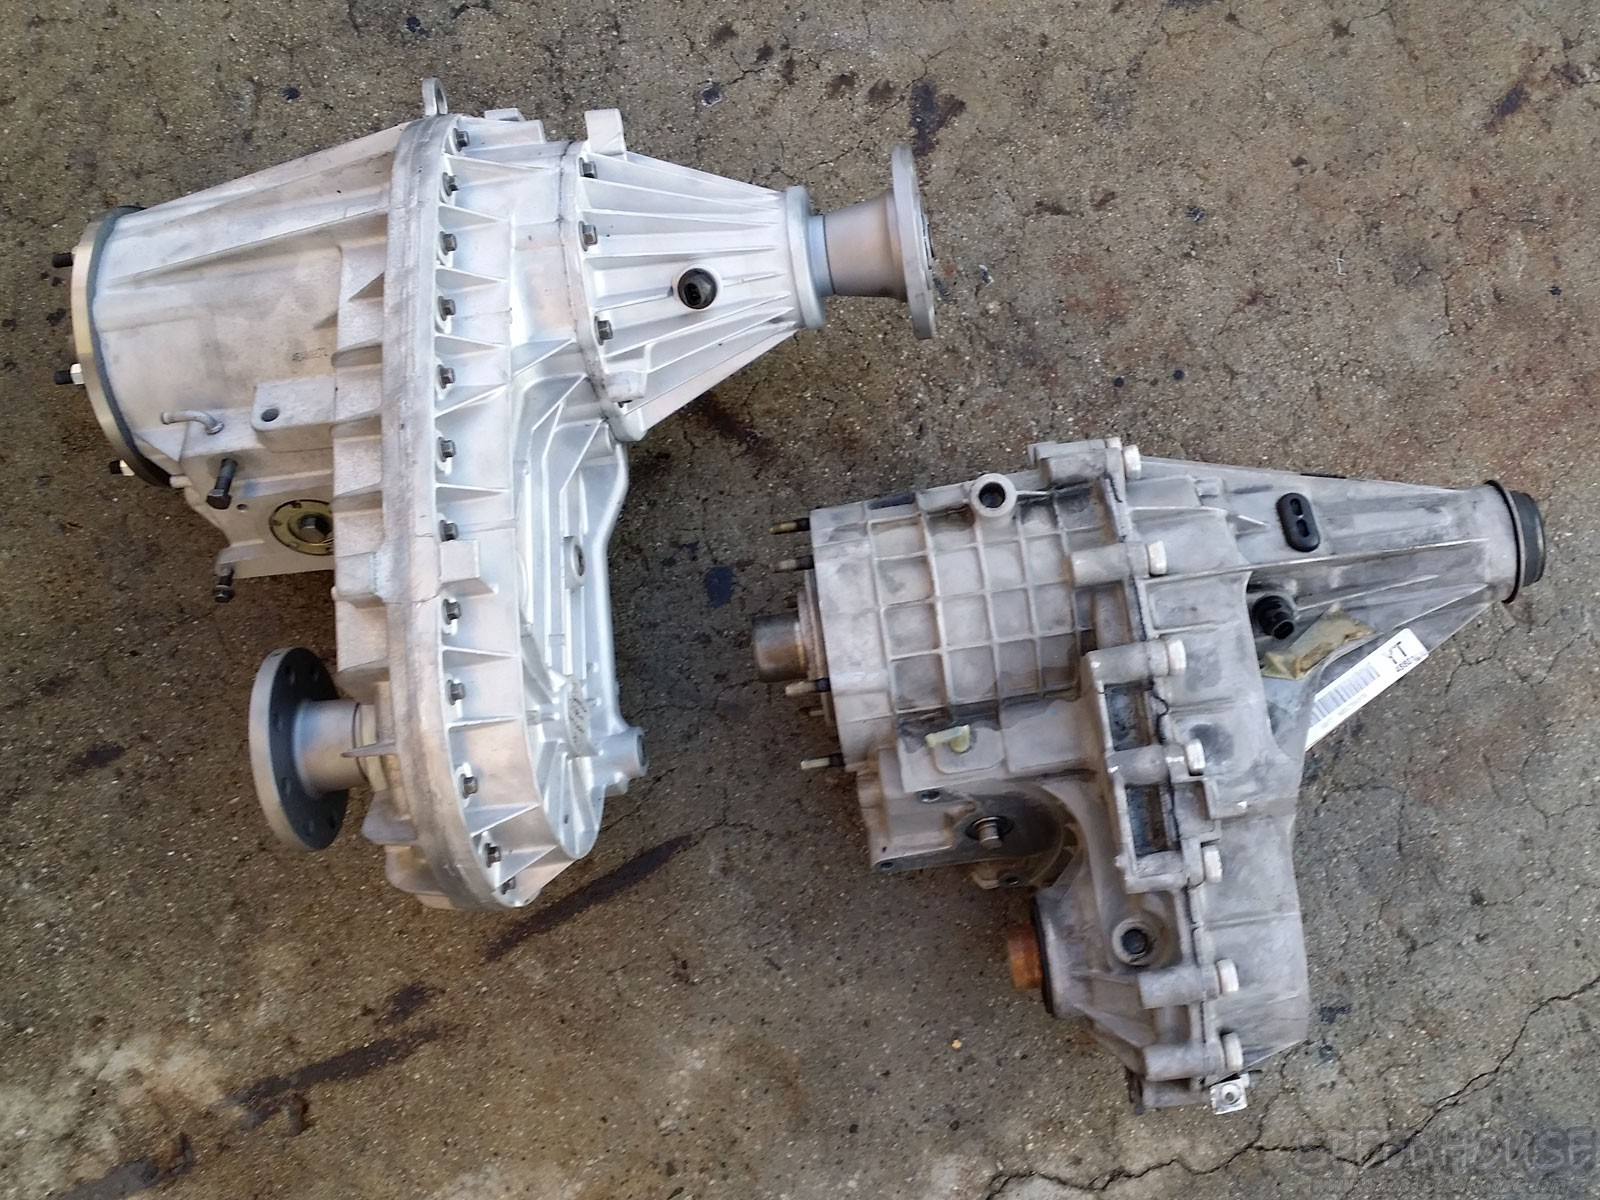 2017 Chevrolet Silverado 3500hd Truck Review Change additionally Trailblazer besides Used Chevy 4x4 Trucks also Duramax Transfer Case Oil Pump Rub Fix Nv273 Conversion Sas Kit Upgrade together with Cc0240. on chevrolet duramax